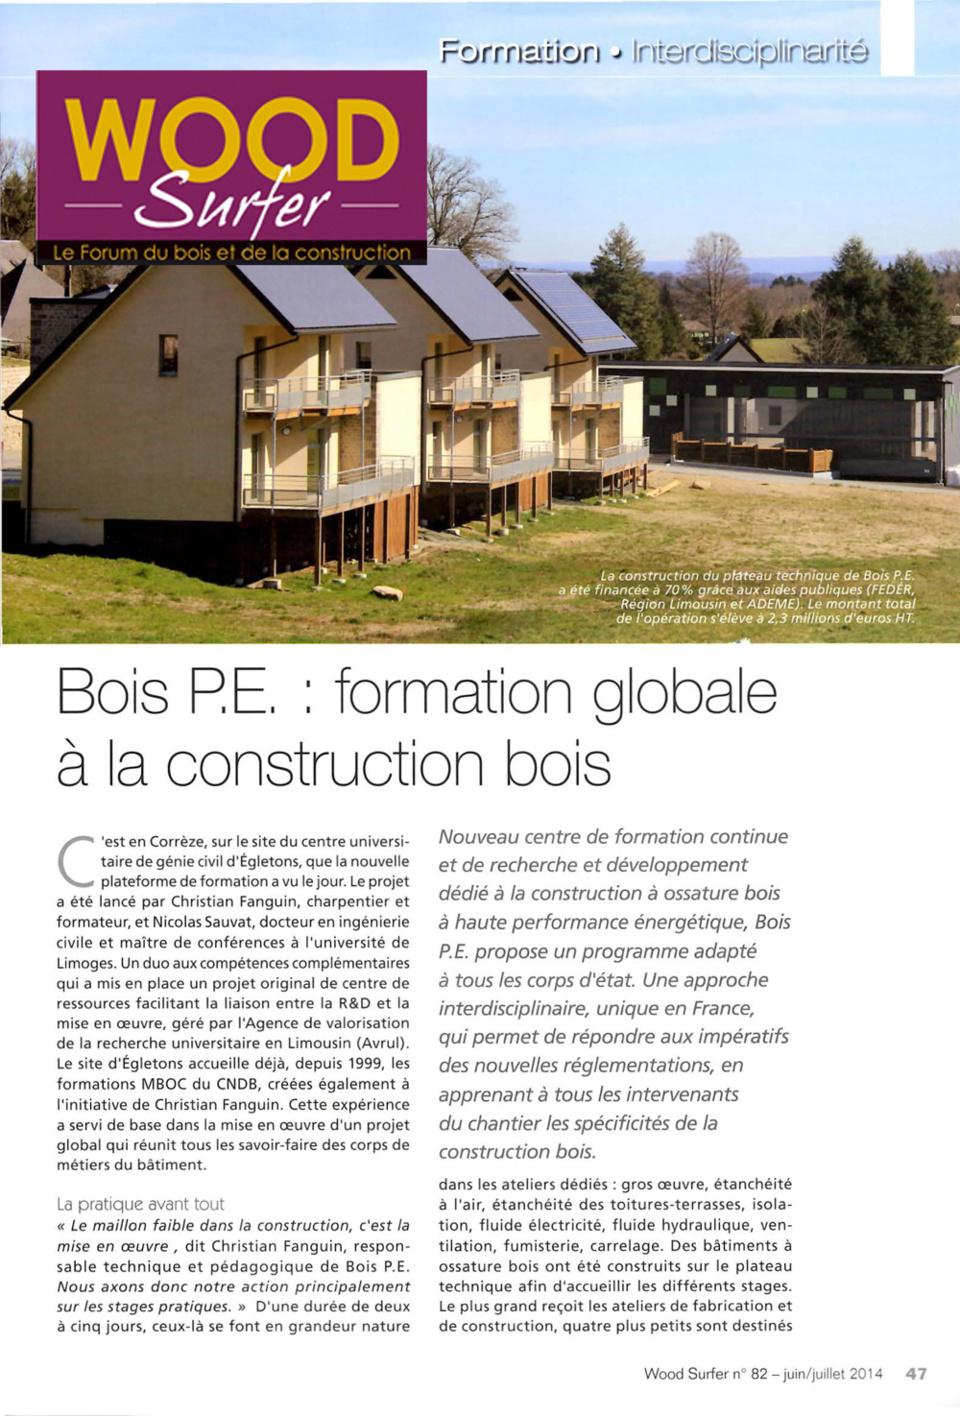 Wood Surfer Bois PE, formation globaleà la construction bois # Formation Construction Bois